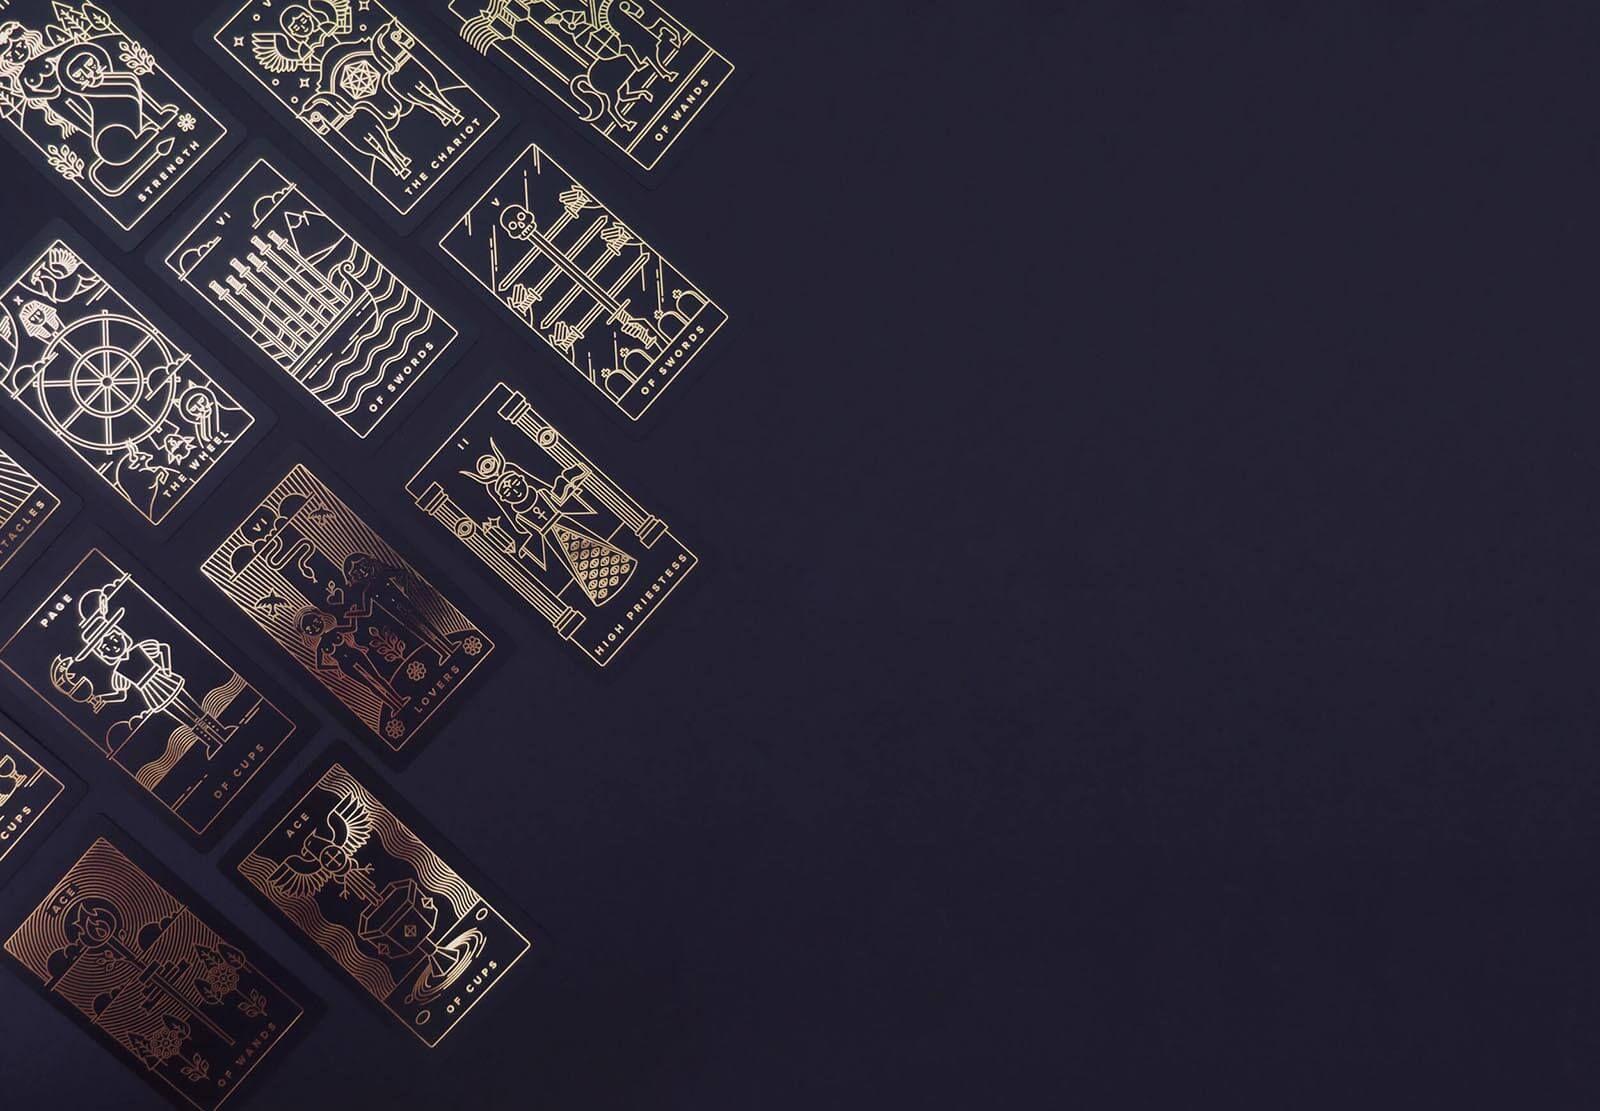 Golden Thread Tarot Deck Con Immagini